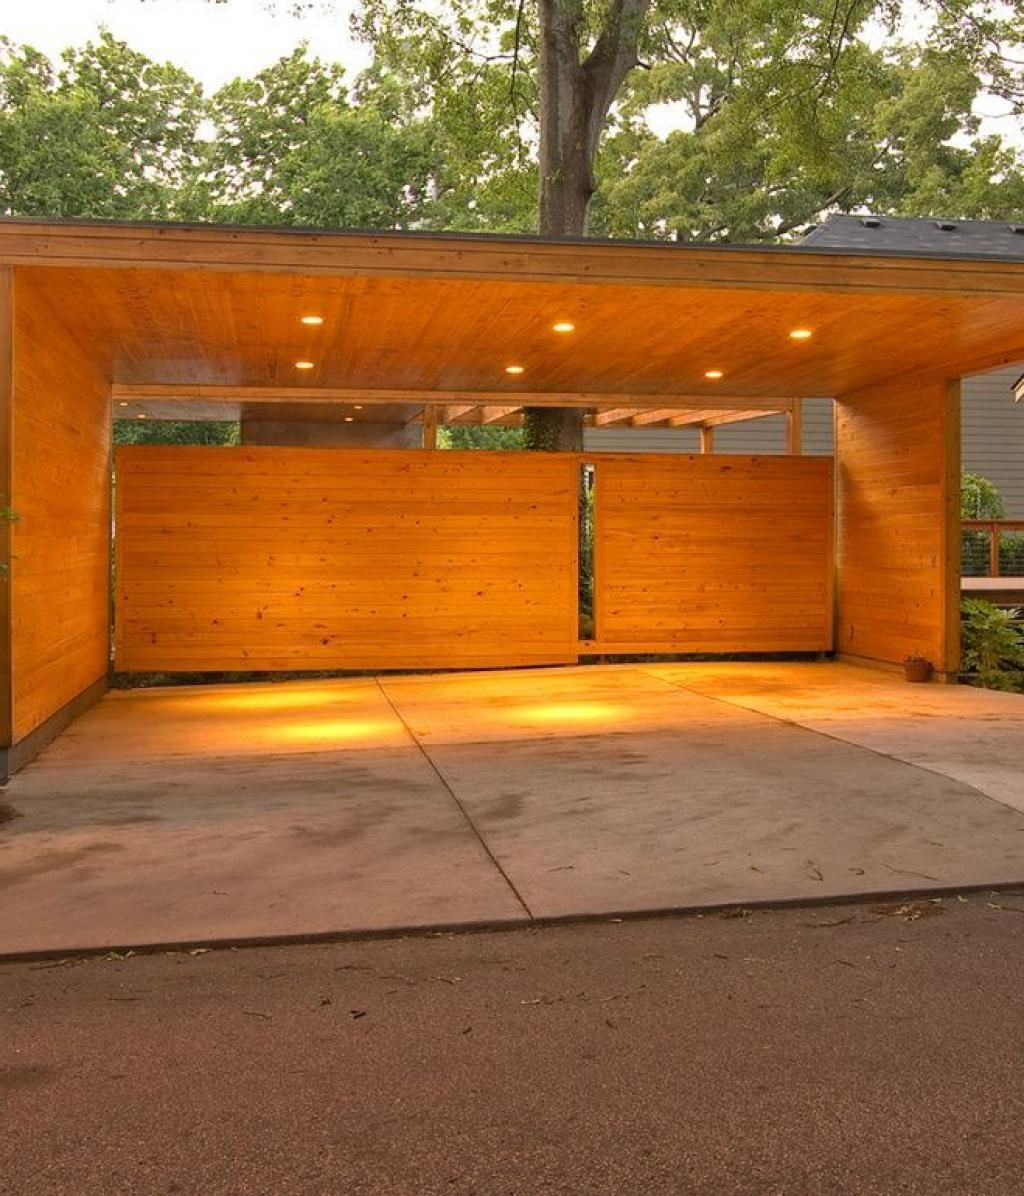 Impresive Design Carport Area With Wooden Design Material